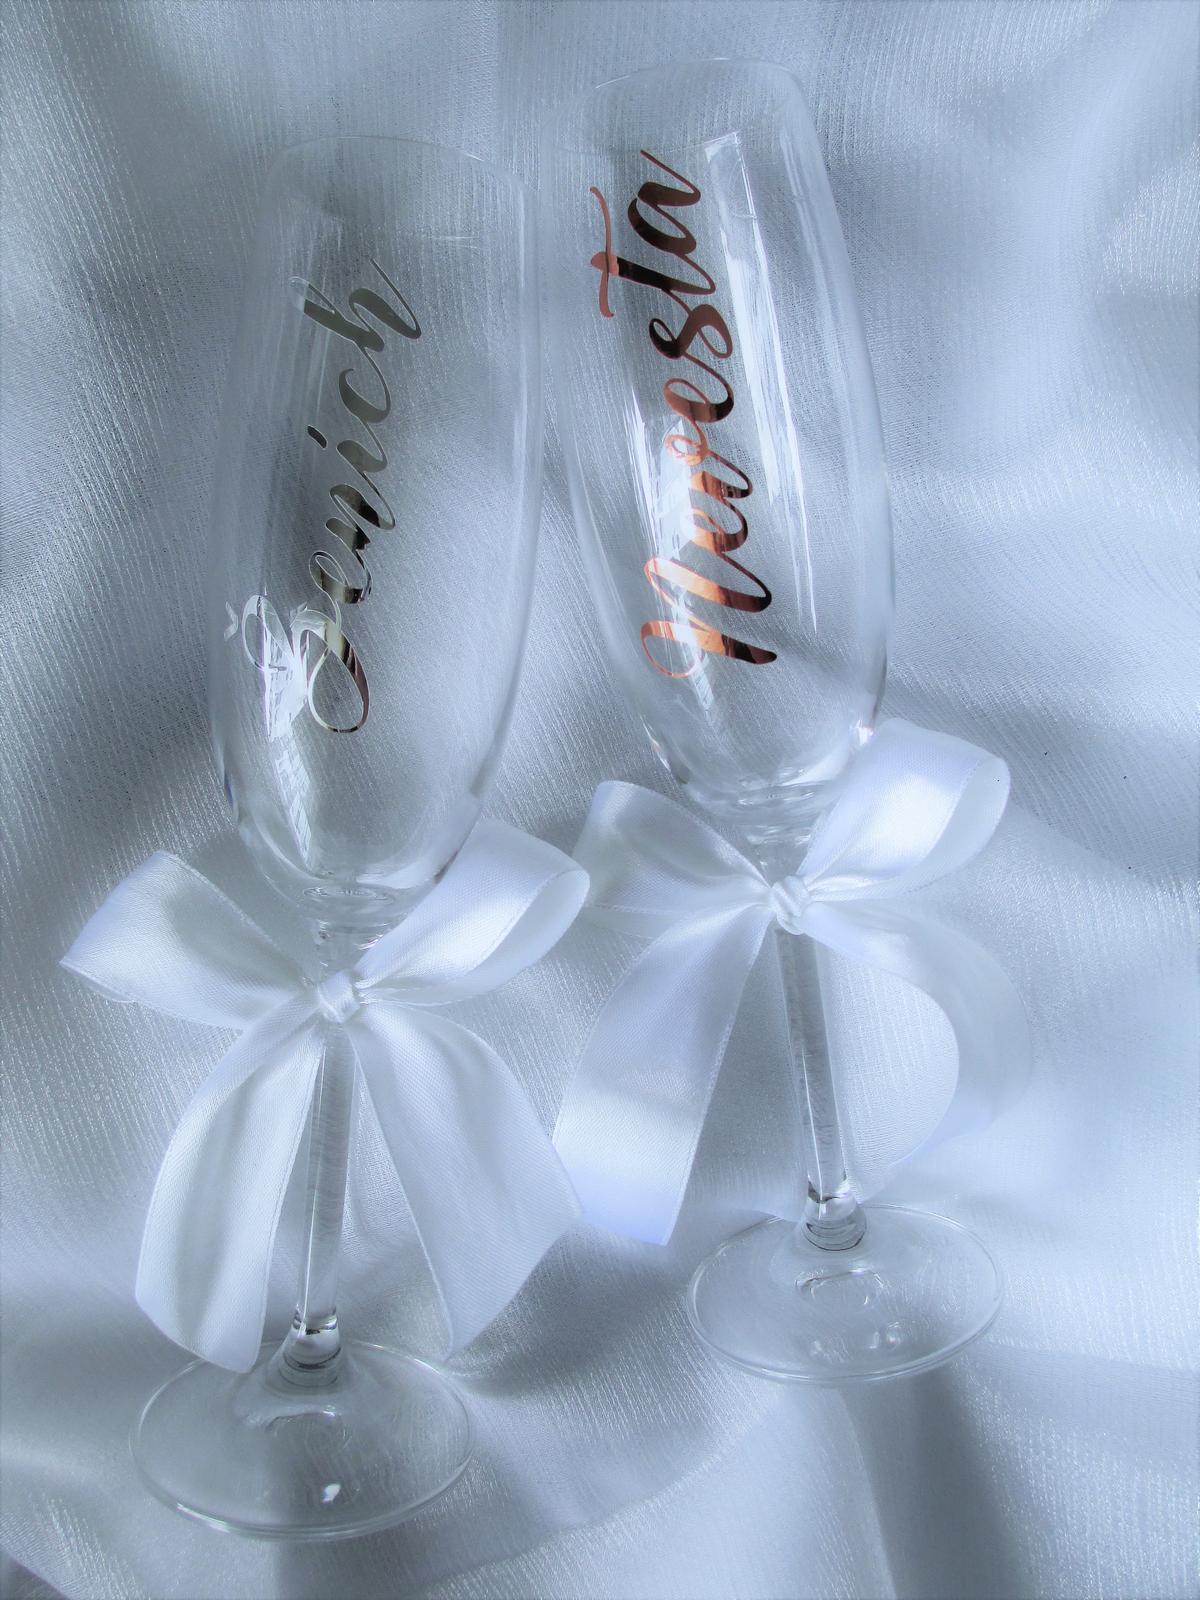 Svadobné poháre - Obrázok č. 33